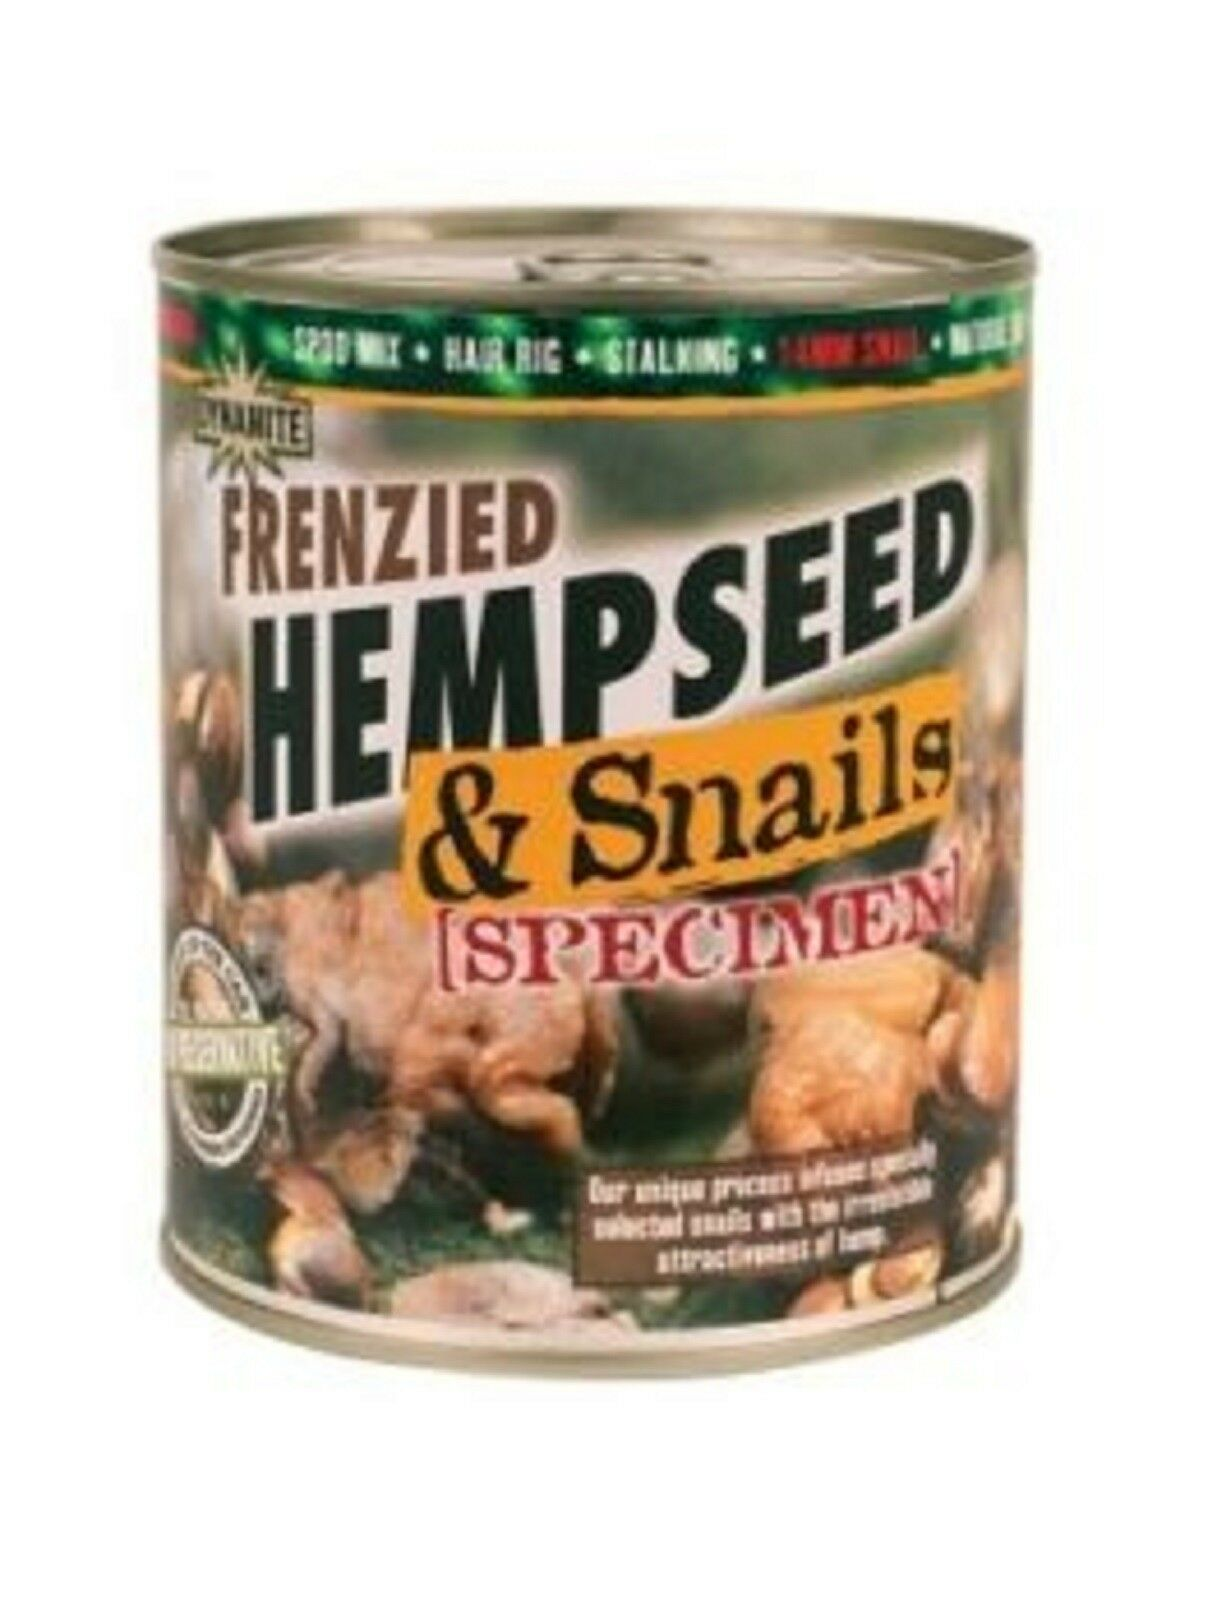 12 x 700g Tins Dynamite Hempseed & Snails 14mm Specimen